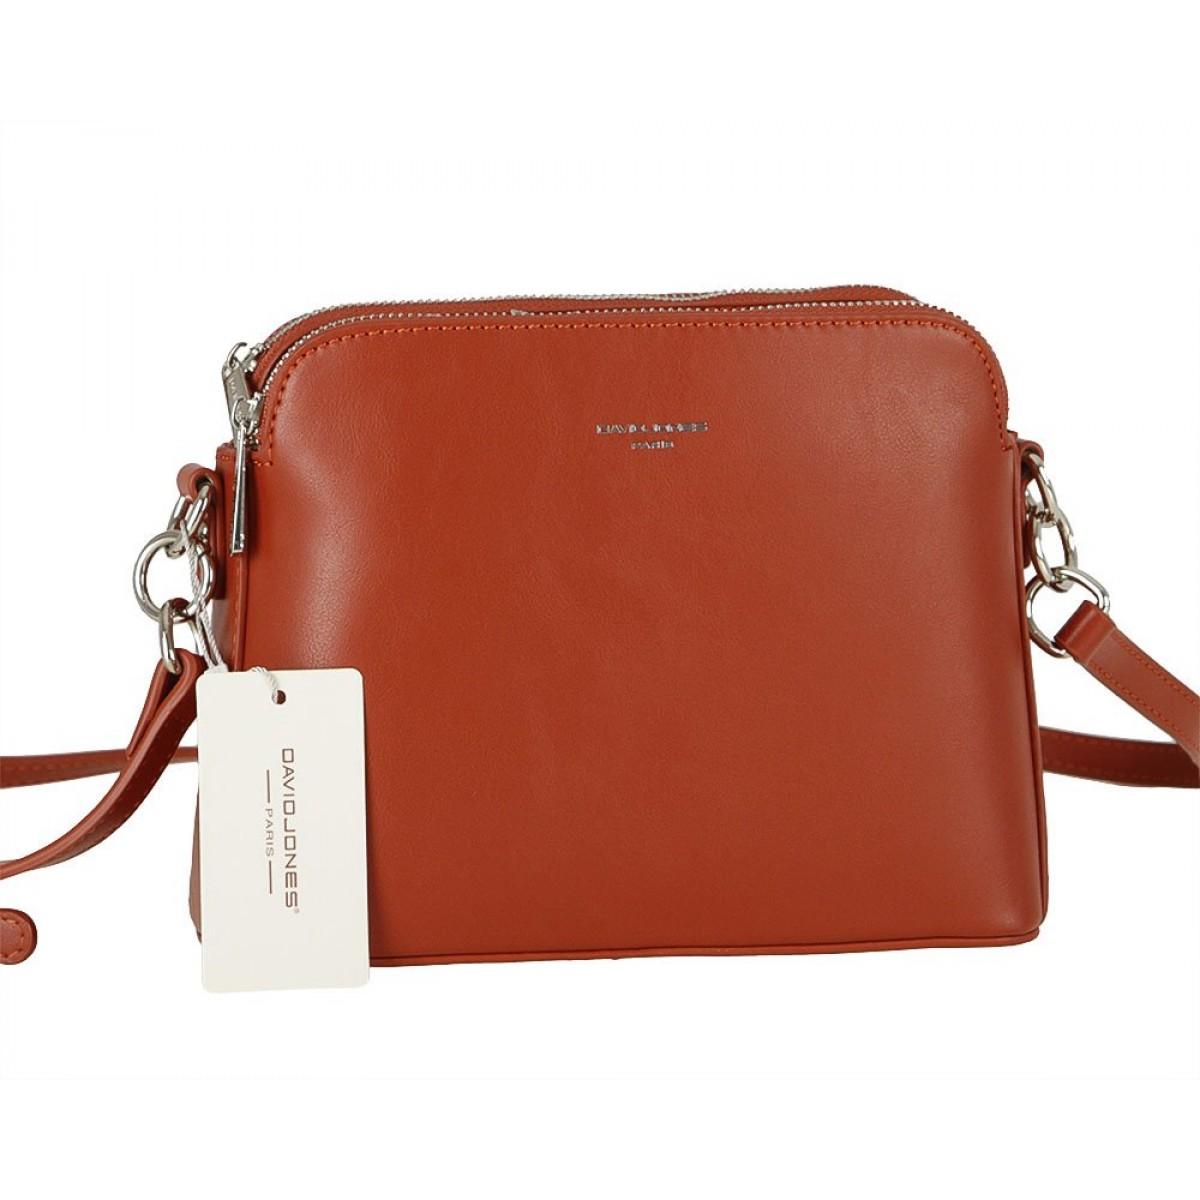 Жіноча сумка David Jones 6407-1 SIENNA